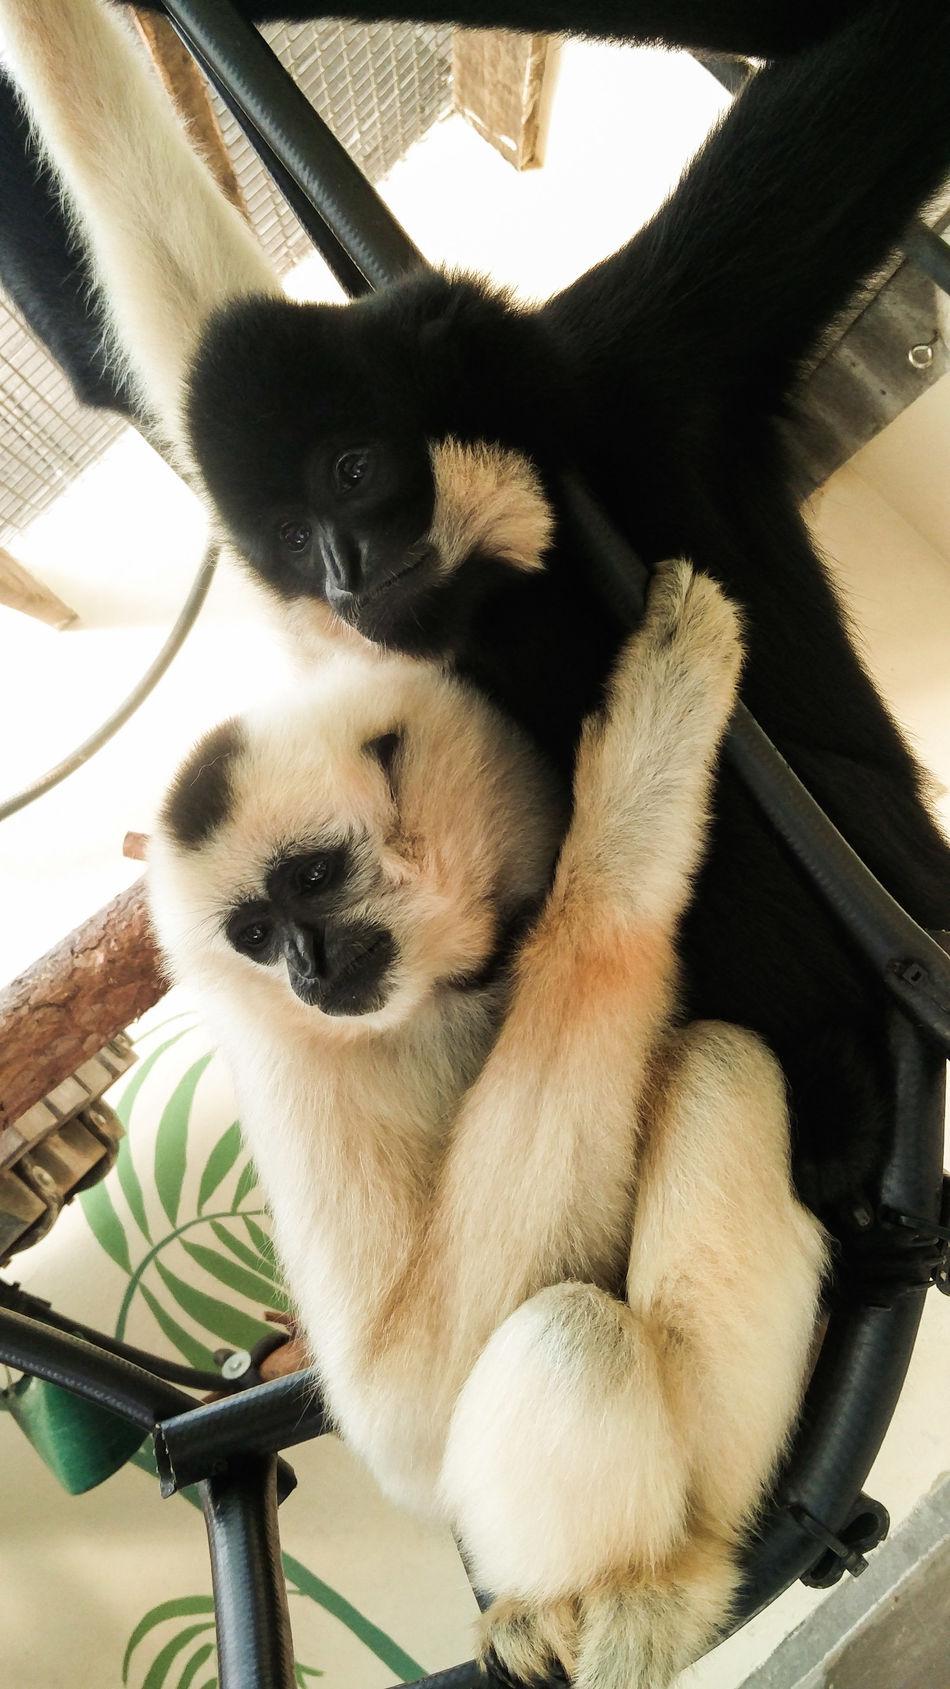 Hugs Animal Mammal No People Animal Themes Day Portrait Indoors  Close-up Monkey Monkeys ConorRouillier Hugs Hugsforeveryone Hugs & Love  Cuddles Cuddle Cuddlebuddies Hanging